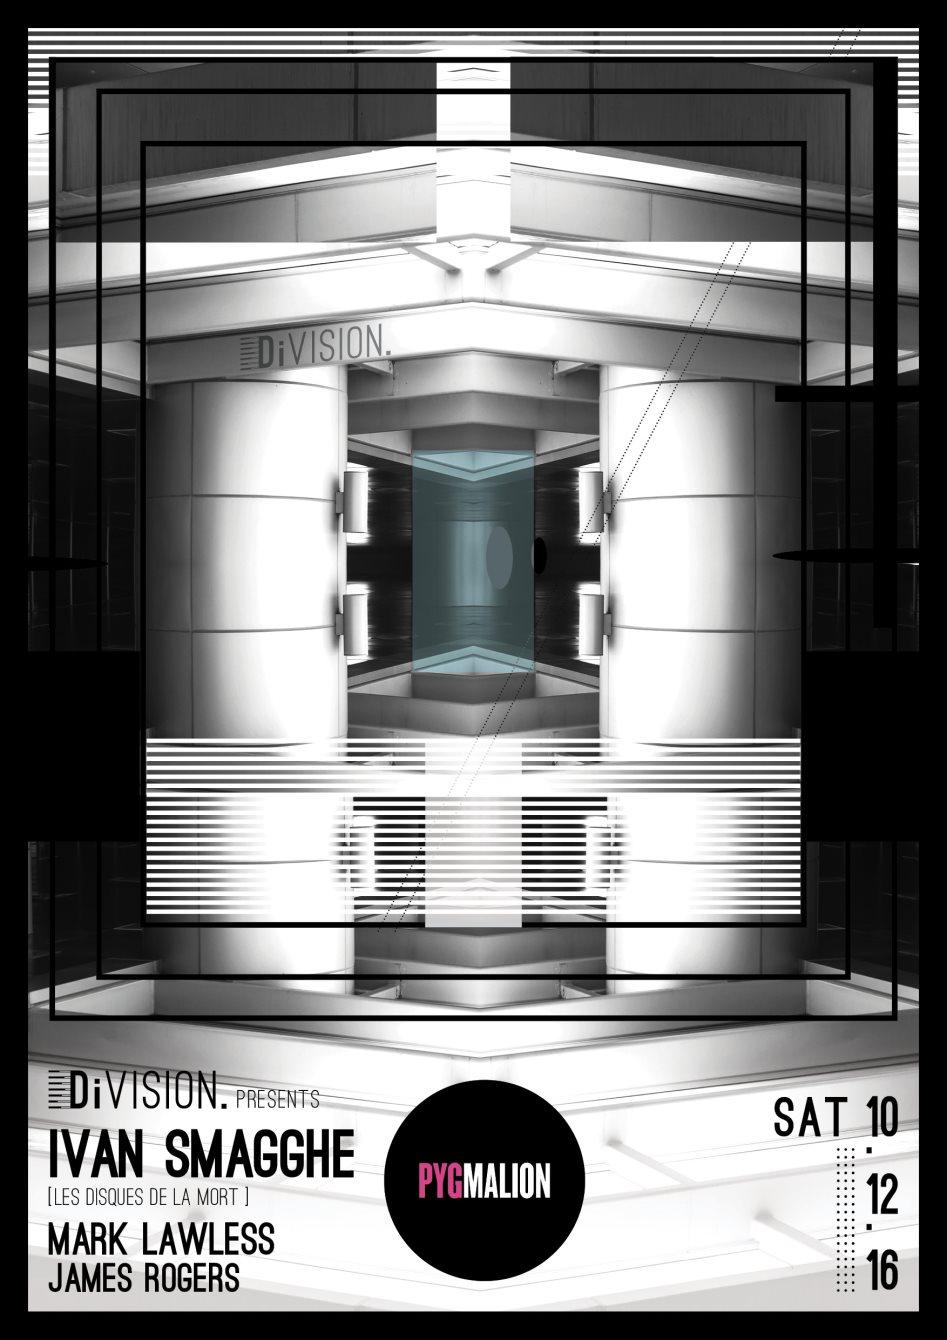 Division: Ivan Smagghe - Flyer back